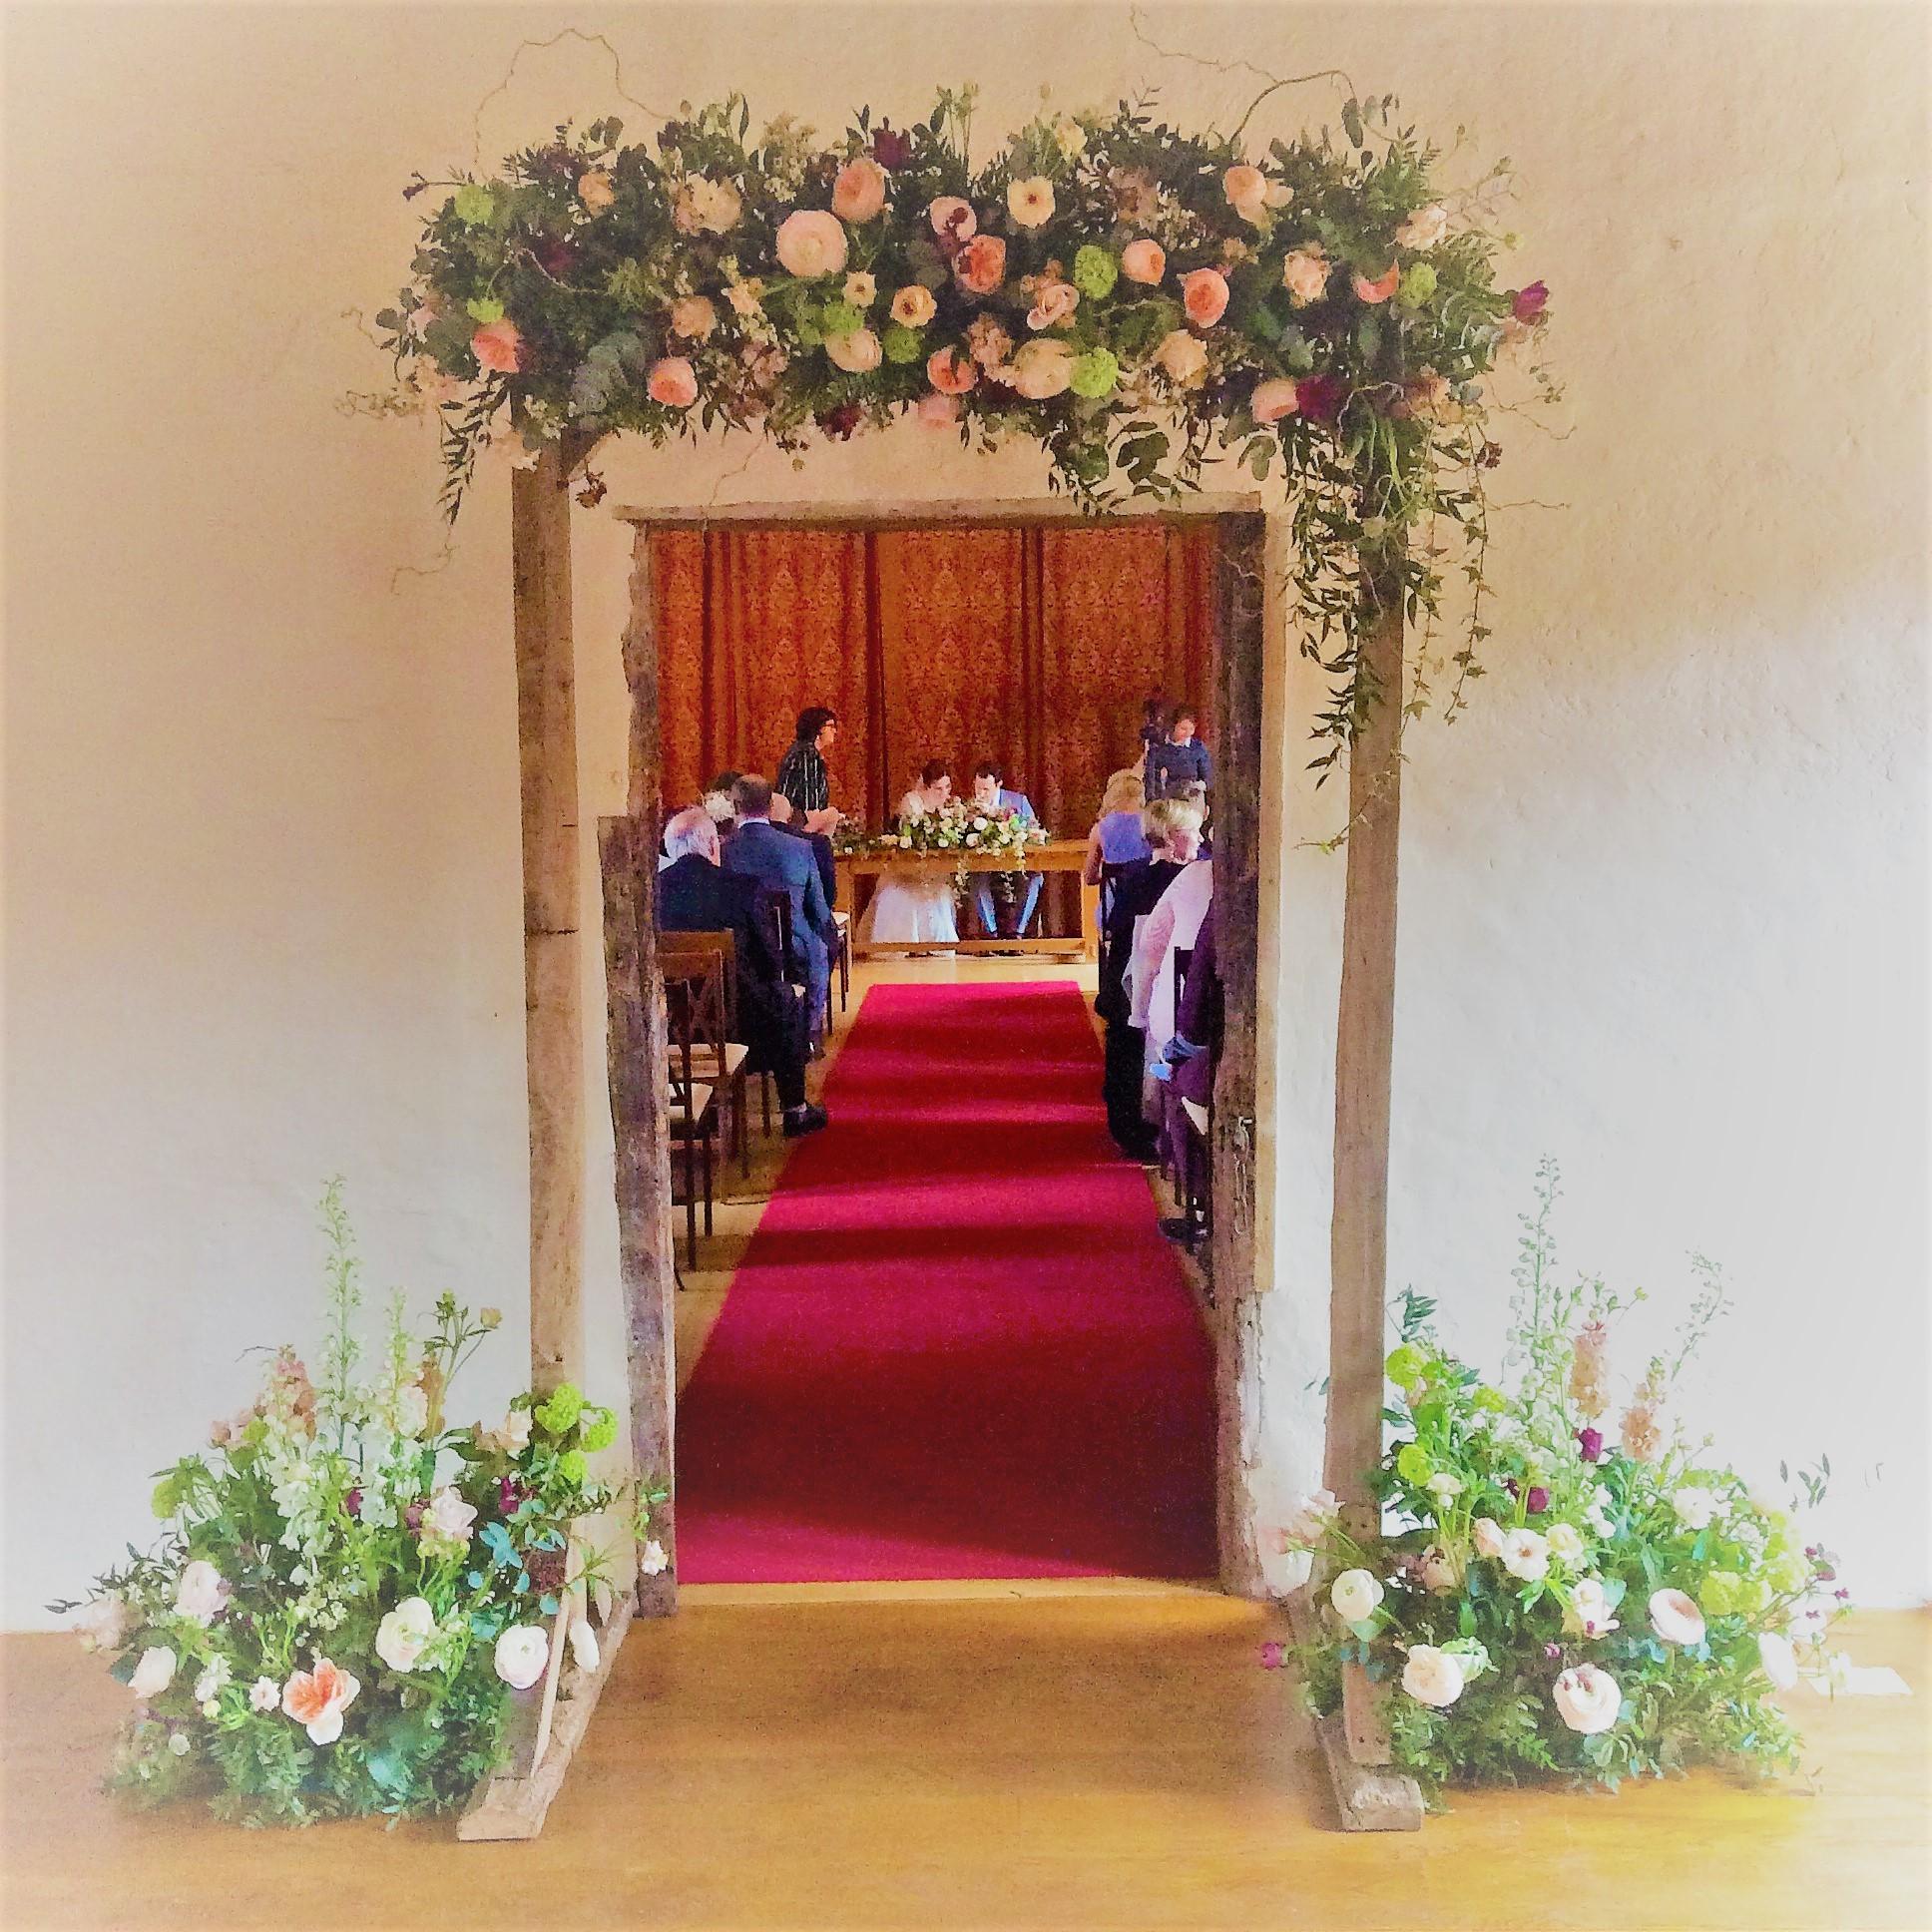 Floral archway into wedding ceremony room